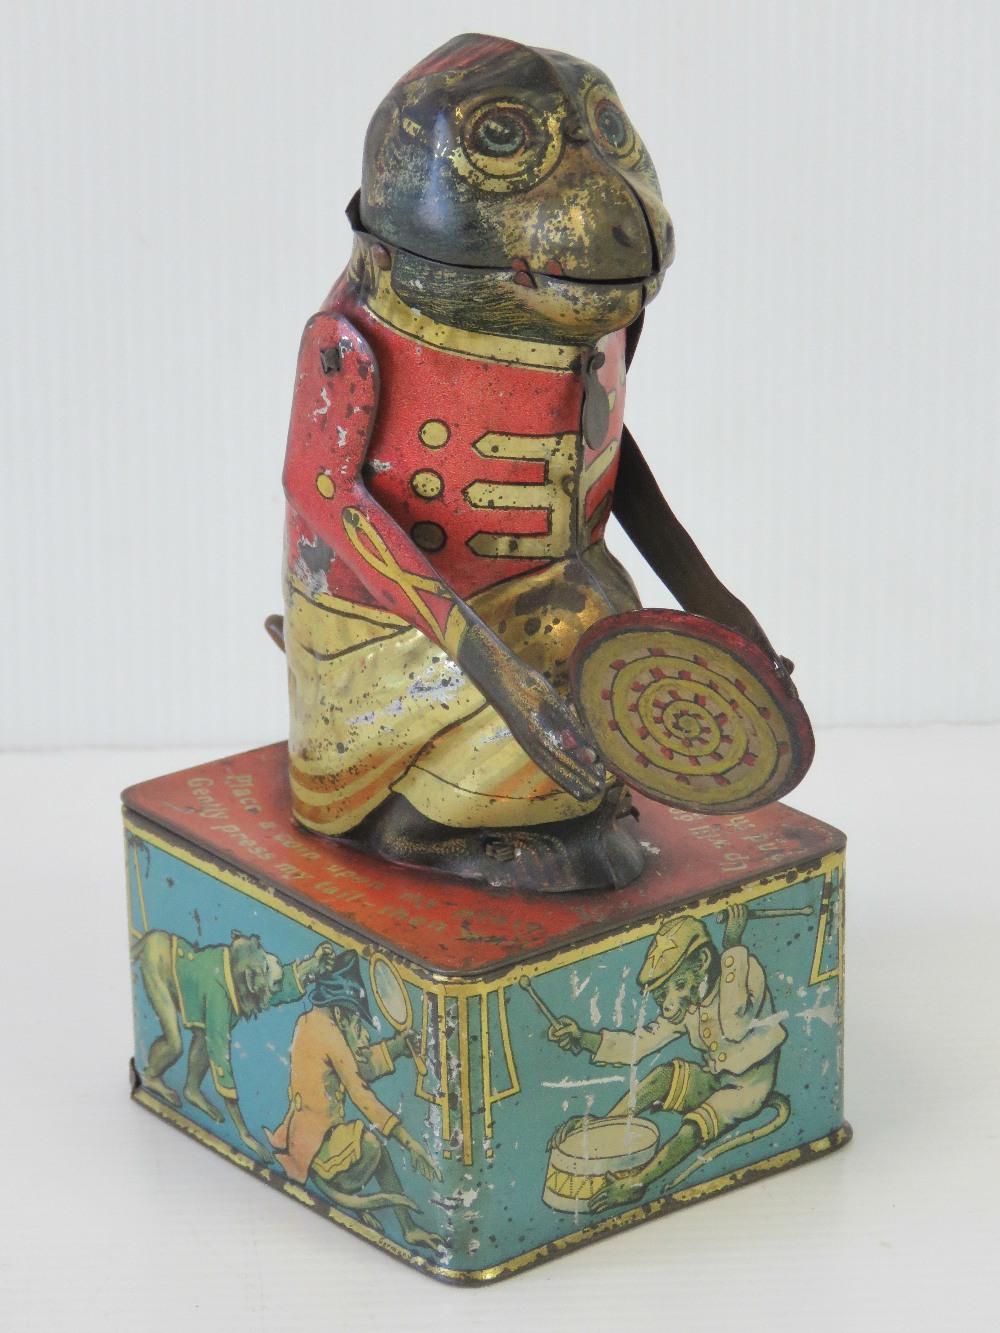 A rare tin plate monkey money box with m